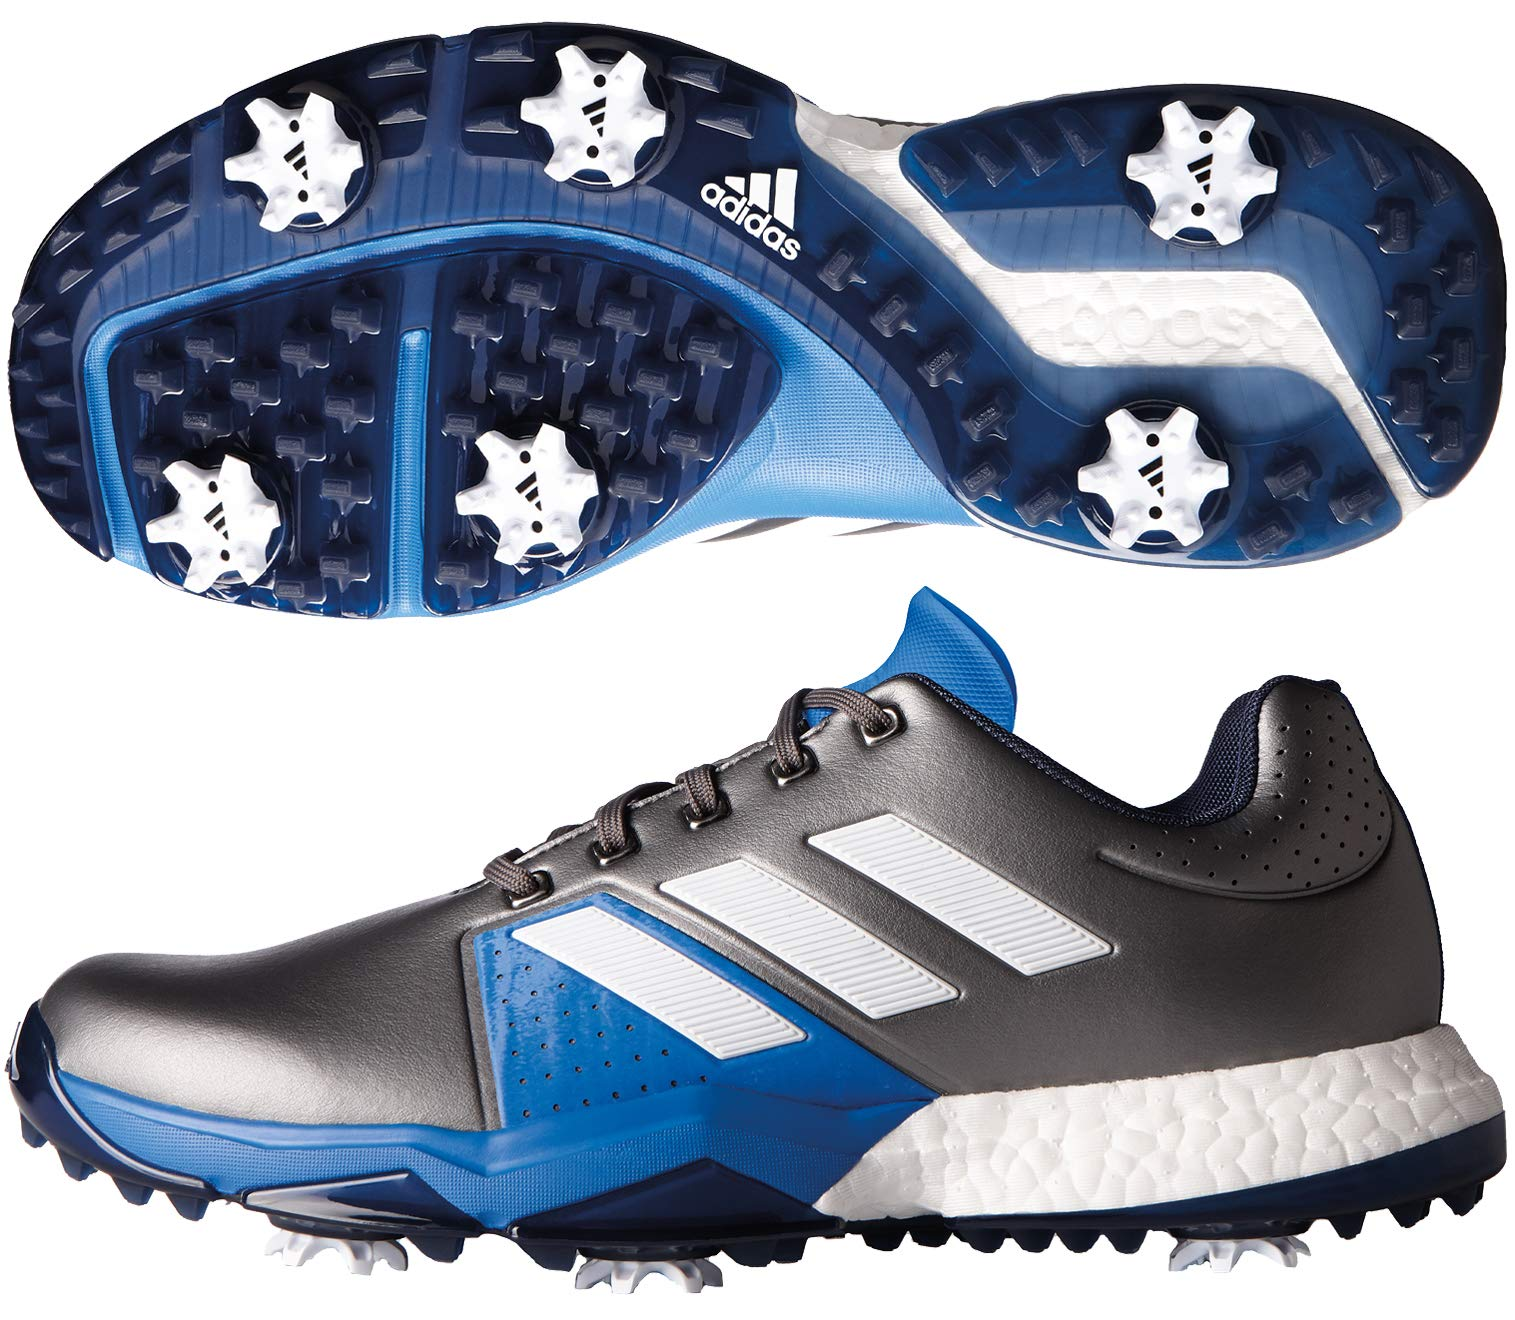 adidas Men's Adipower Boost 3 Golf Shoe, Dark Silver Metallic/White/Blast Blue, 7 M US